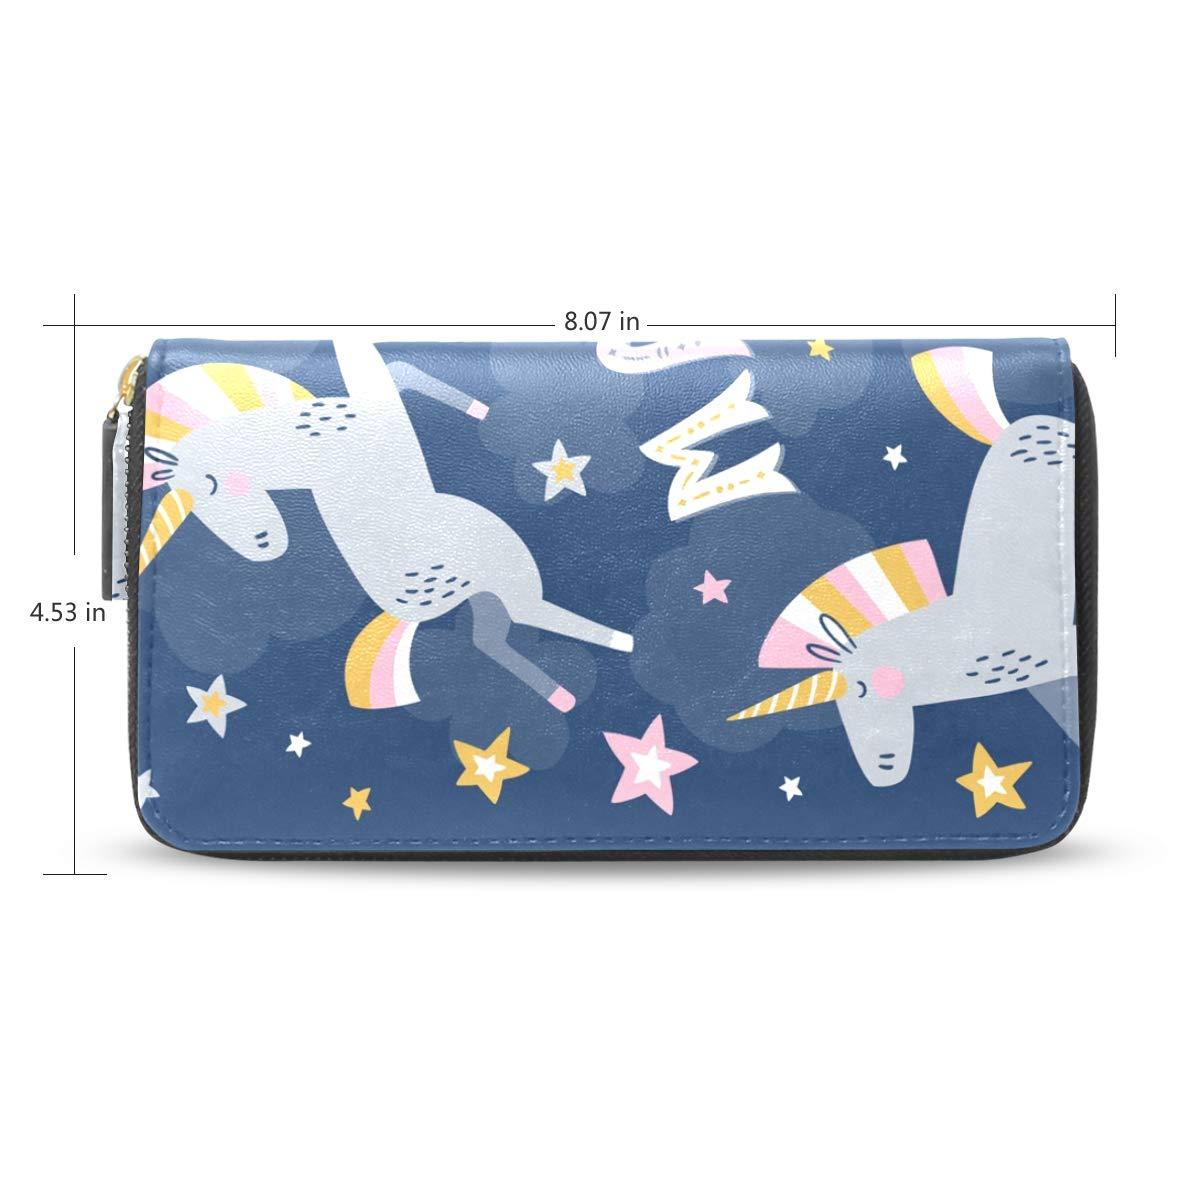 d192957e34ba Women Wallet Purse Clutch Bag Starry Night Magic Unicorn Zipper ...